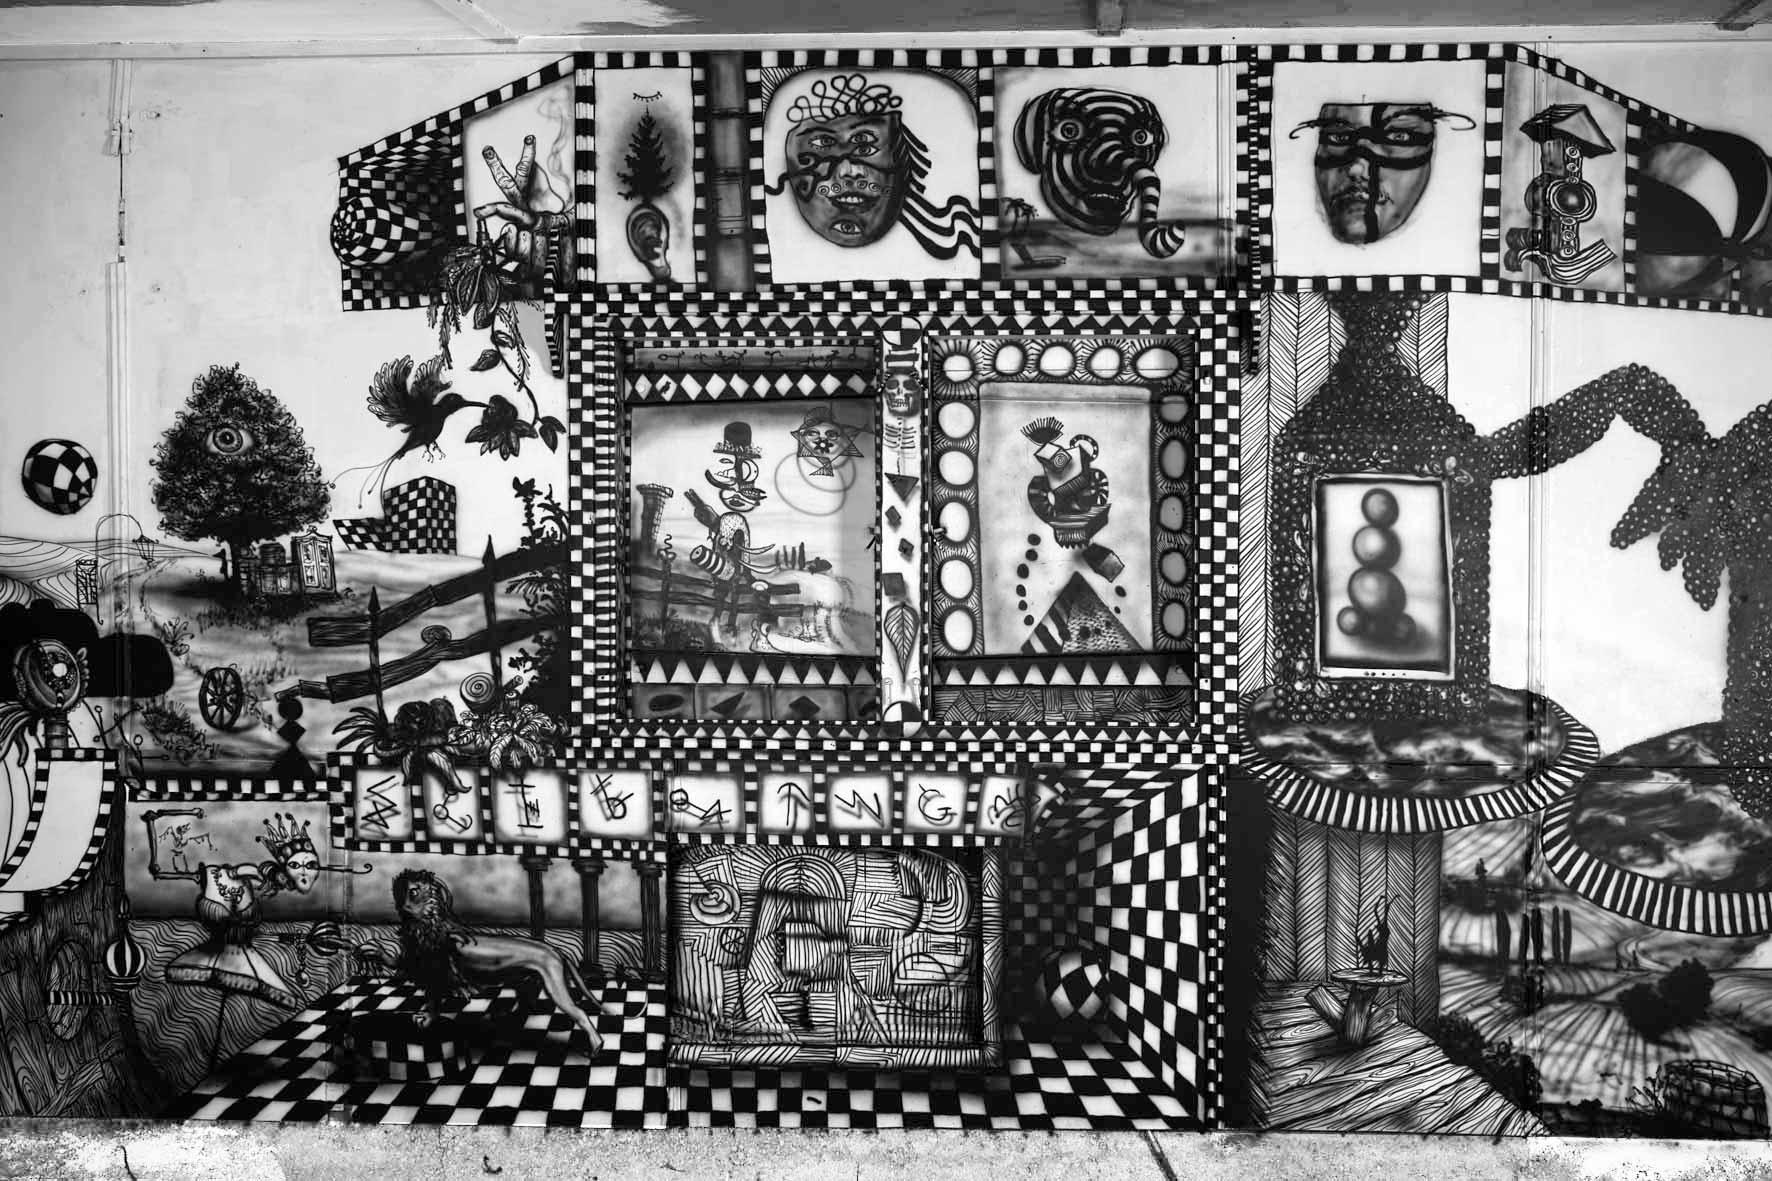 Stefan Inauen O.T. 2016 Wandbild (Permanente Ausstellung, Areal Hof Weissbad, Appenzell) Acryl auf Holz 240cm x 1000cm